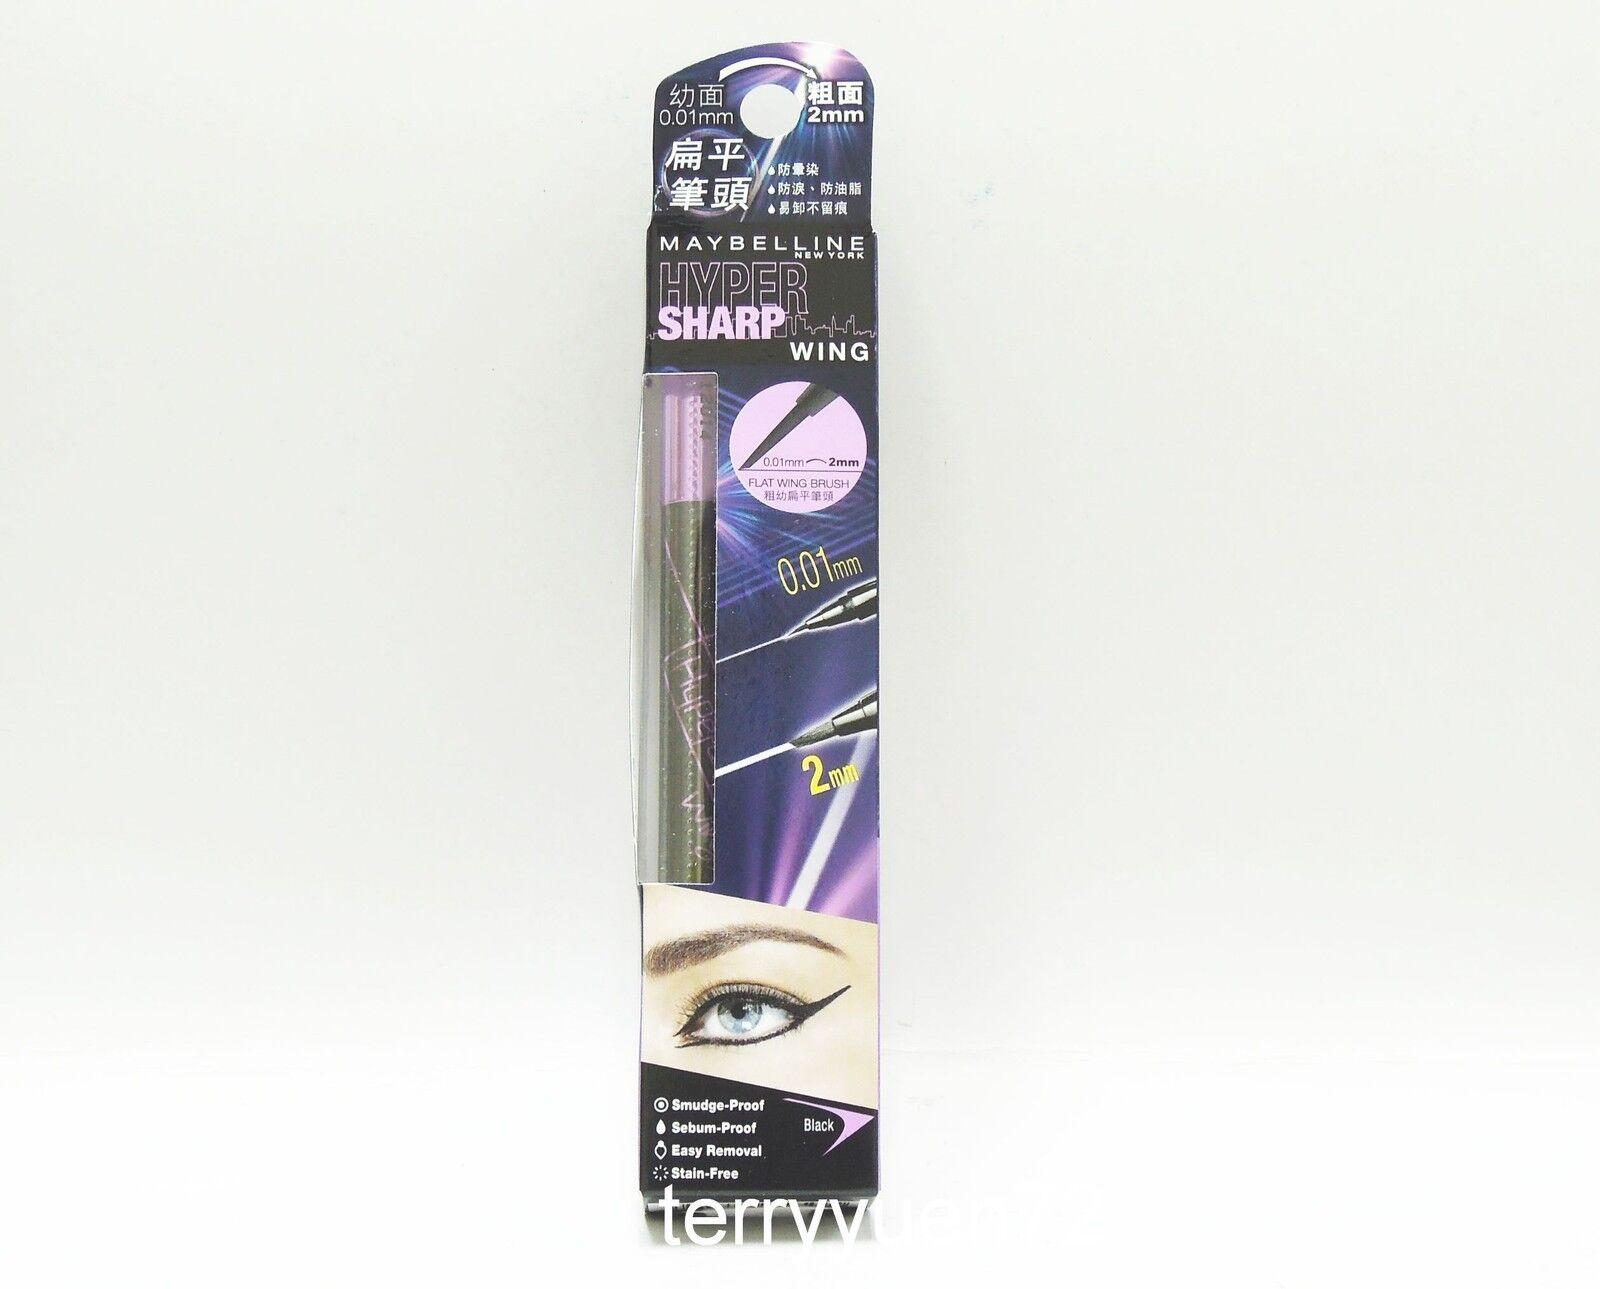 Maybelline Eye Studio Hyper Sharp Liner Wing Black 2015 Ebay Ink Norton Secured Powered By Verisign